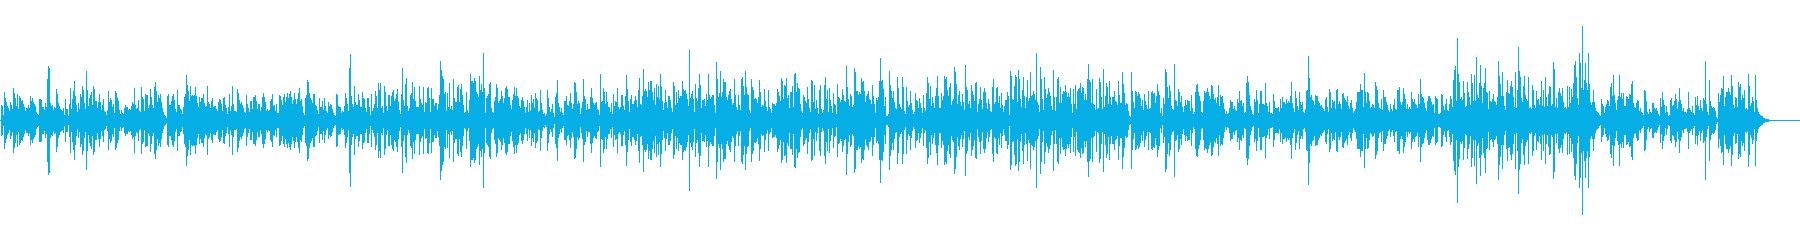 JAZZ|カフェ・喫茶店の音楽|ピアノの再生済みの波形